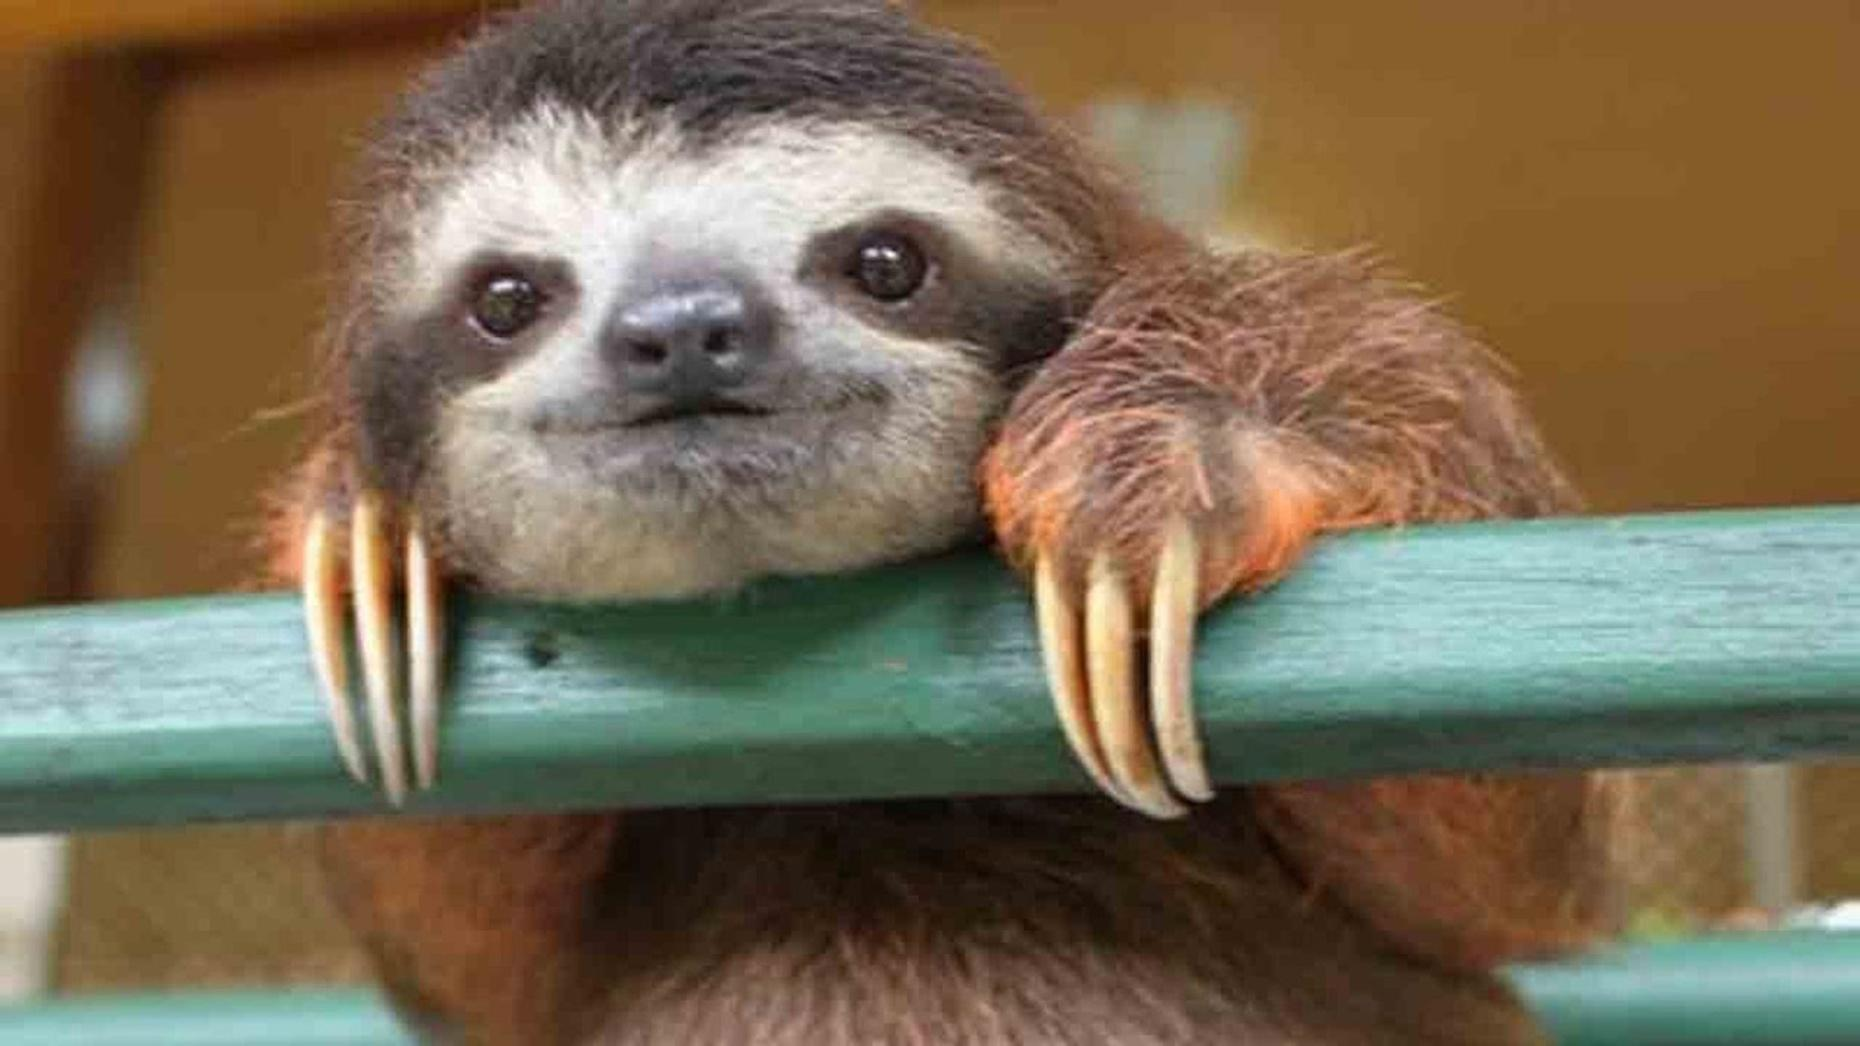 Sloth Encounter at a Zoo in Georgia